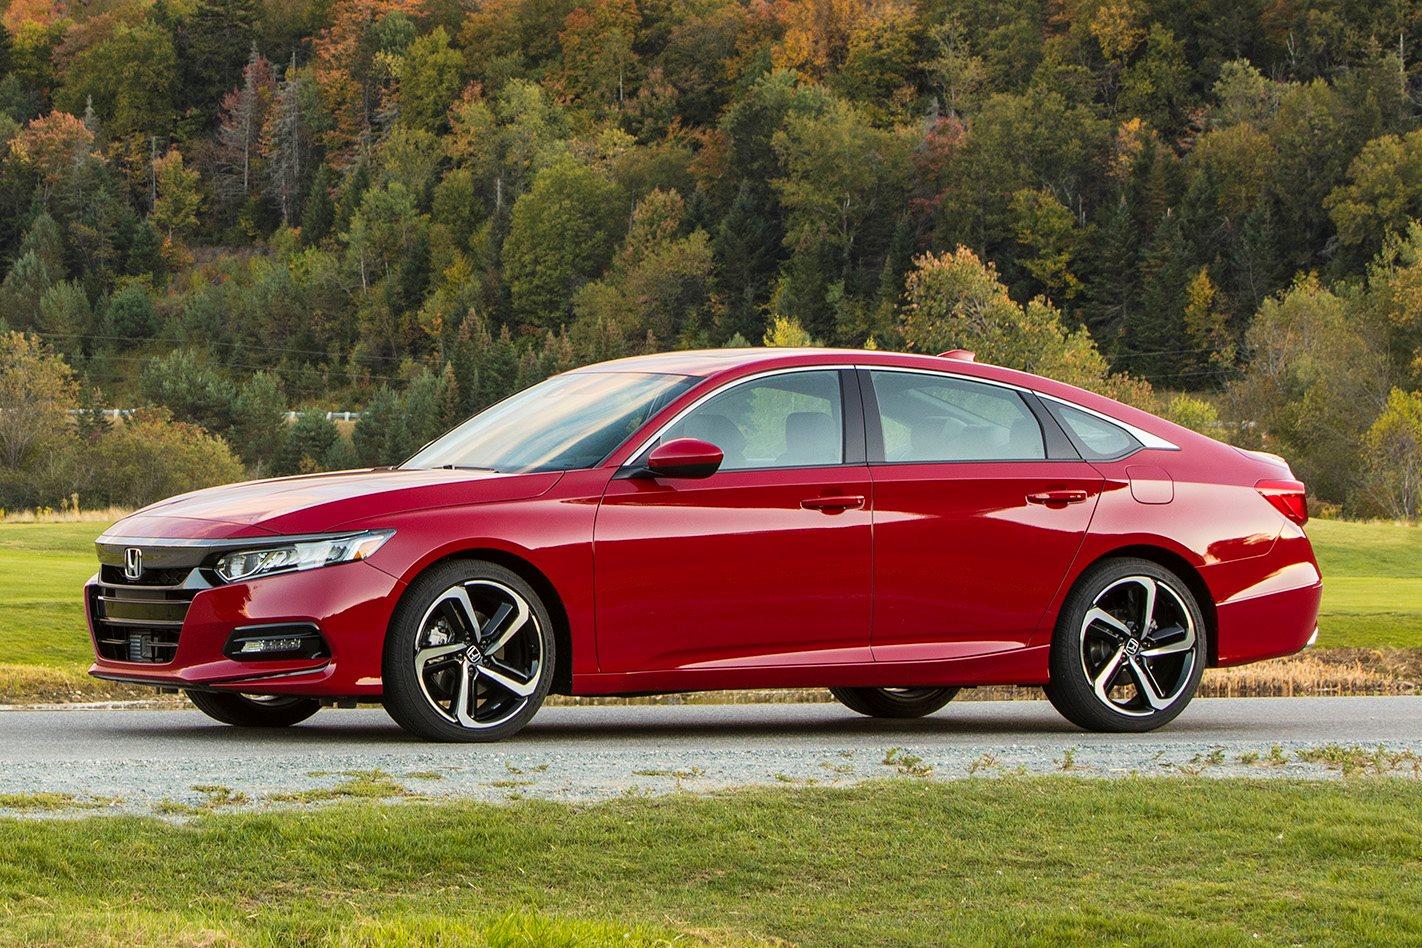 The 2020 Honda Accord will be no bargain